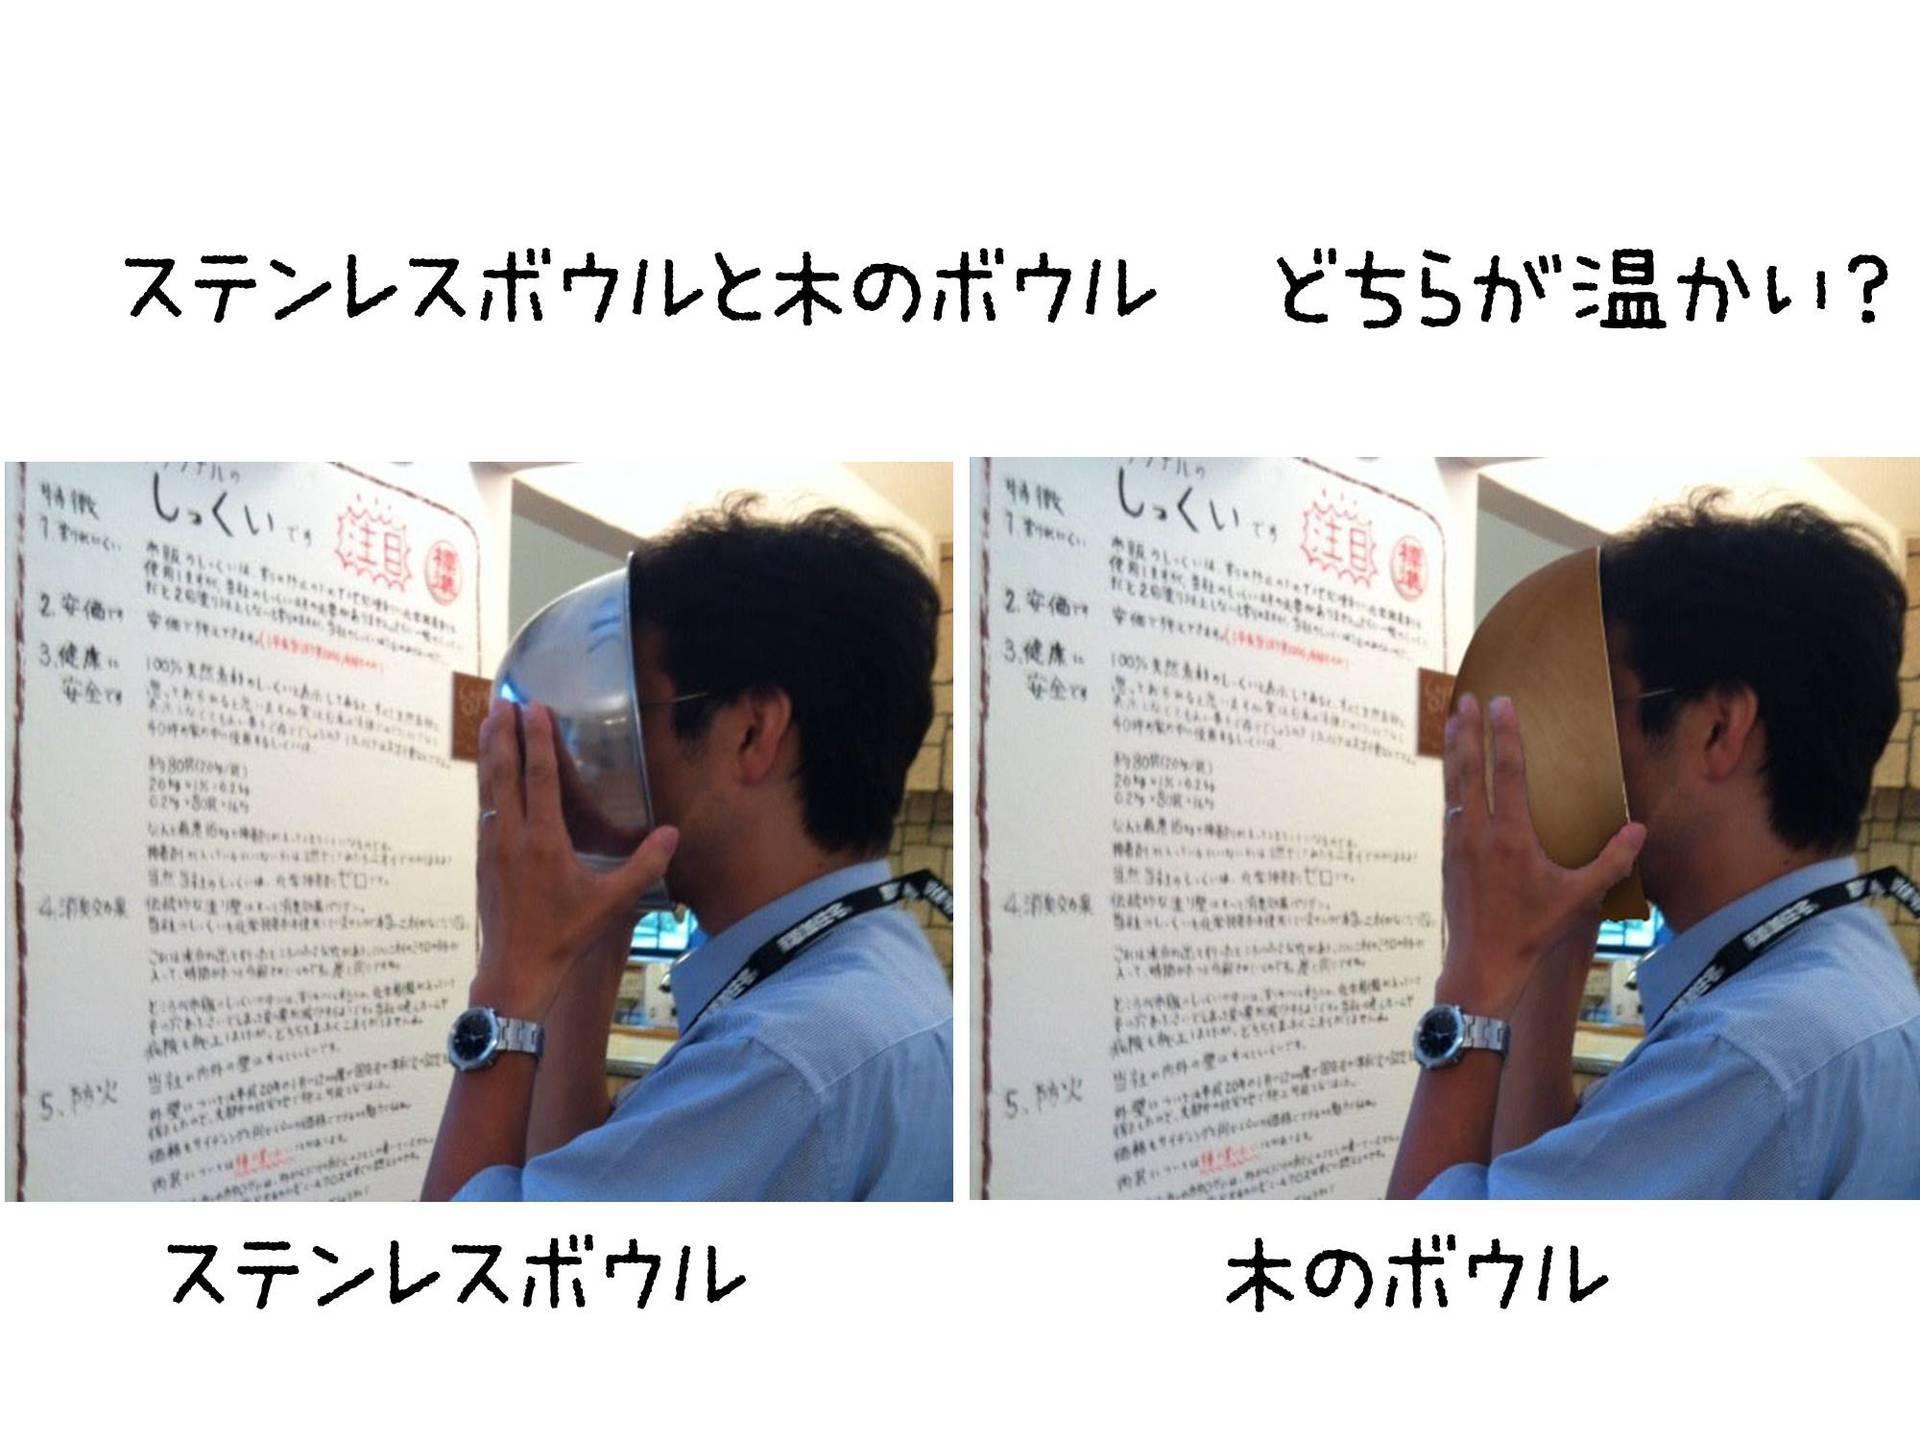 Sスライド37.JPG